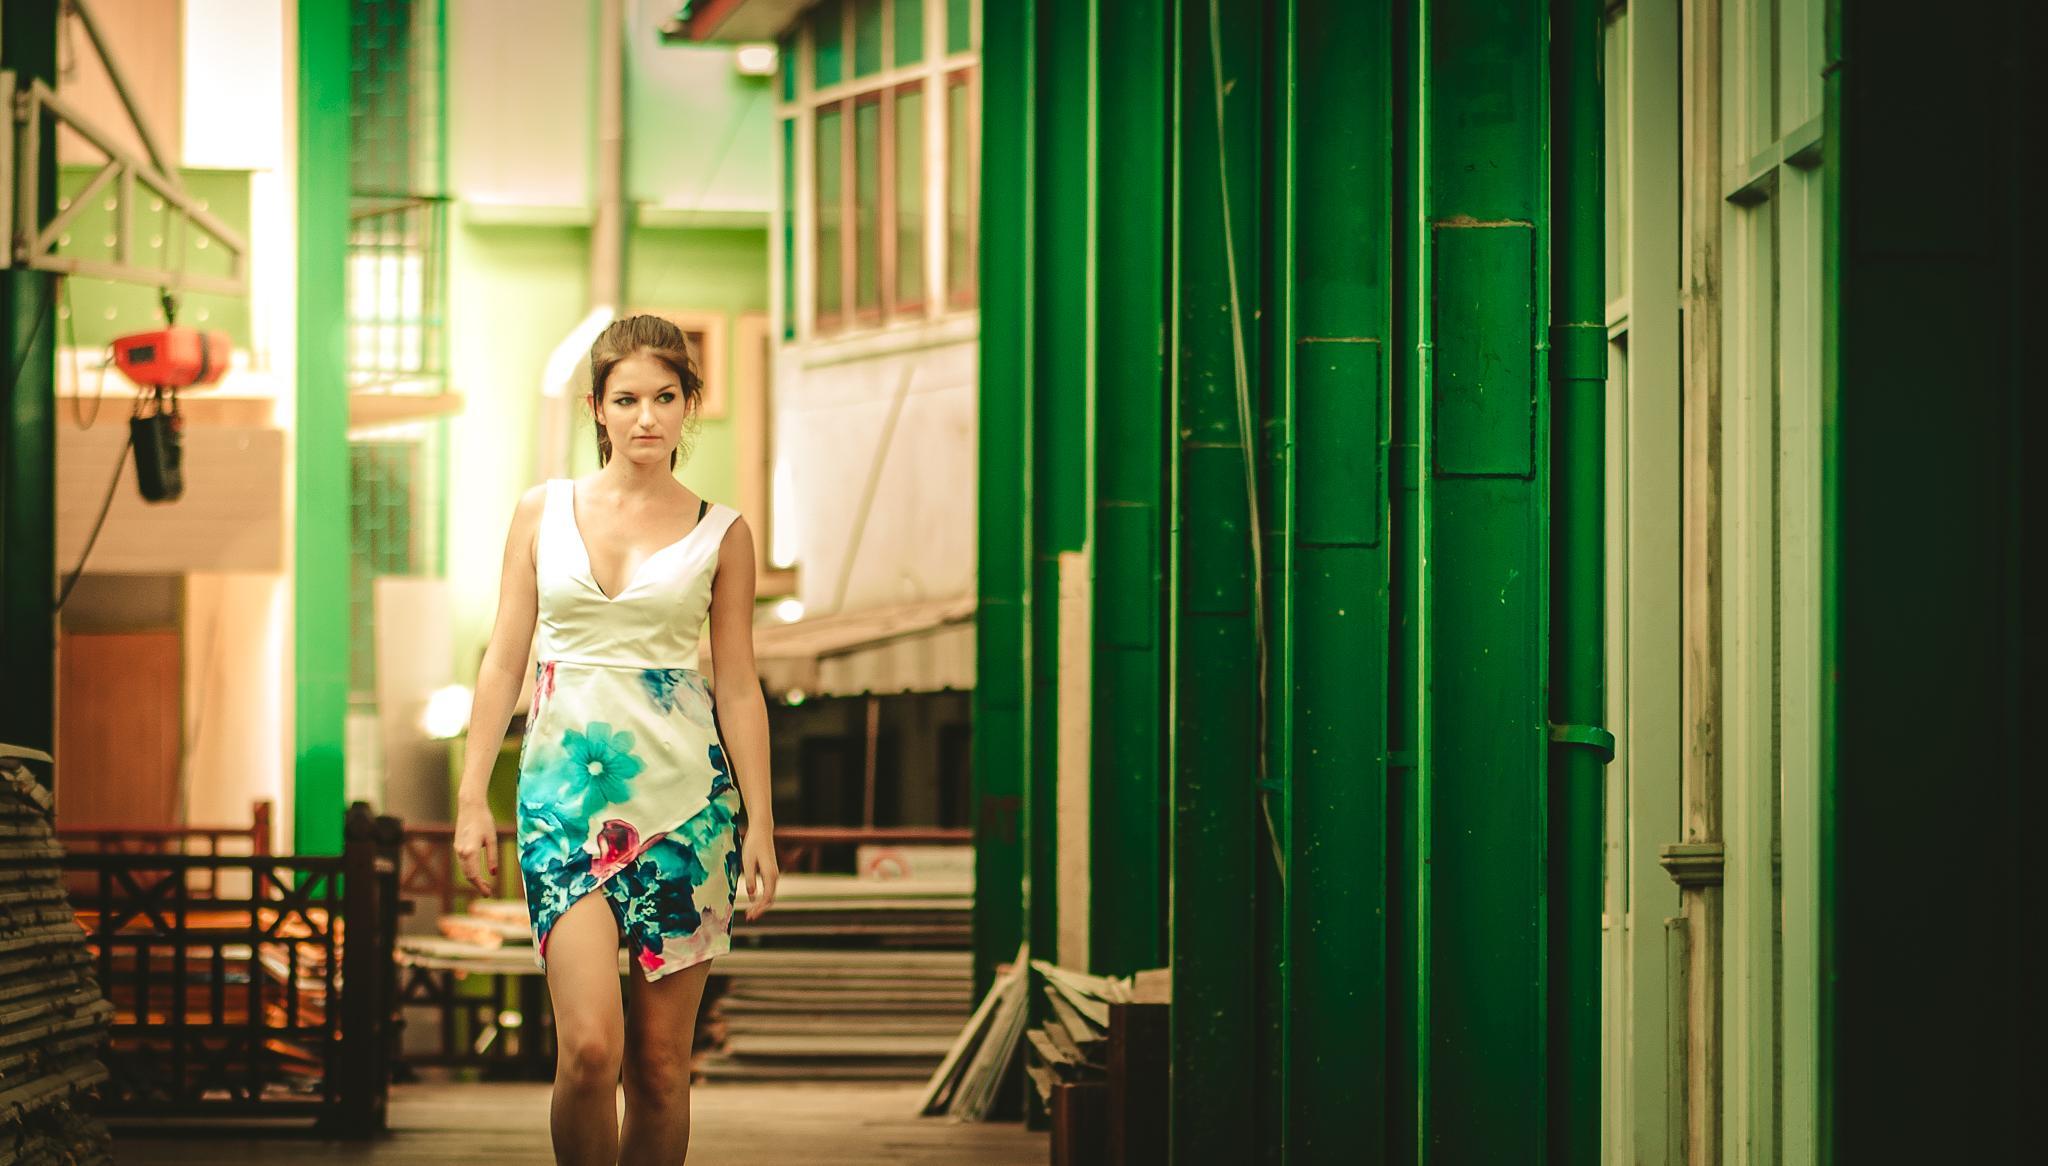 The walk by Kapture - Street & Fashion Photography